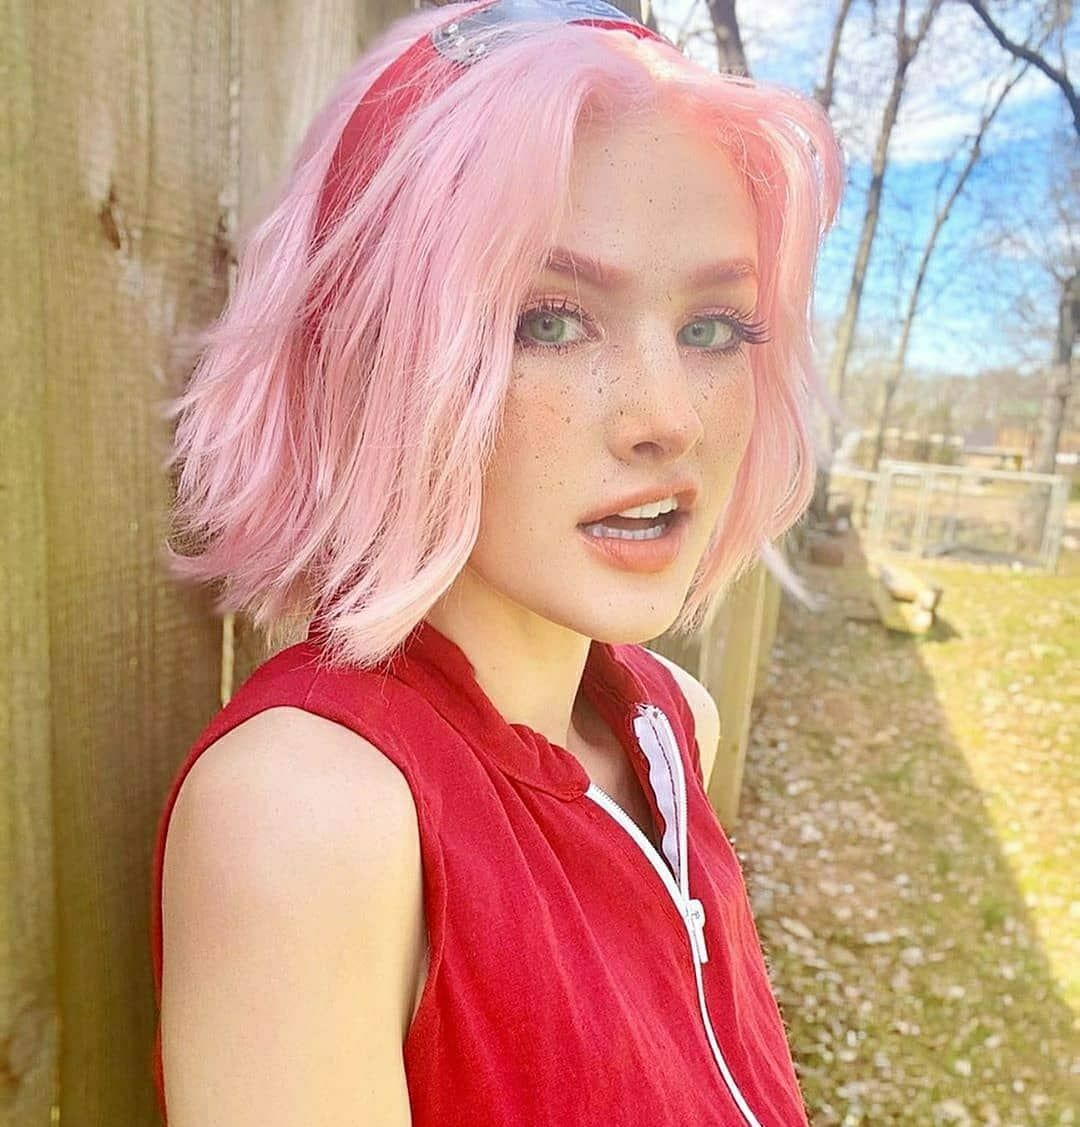 "Photo of ☆Cosplay | Anime☆ on Instagram: ""Sakura Haruno from Naruto  CN: @fratbrother  Follow @cosplay___anime for more ?  #오타쿠 #オタク #動漫 #アニメ #애니메이션 #انمي  #anime #animegirl…"""